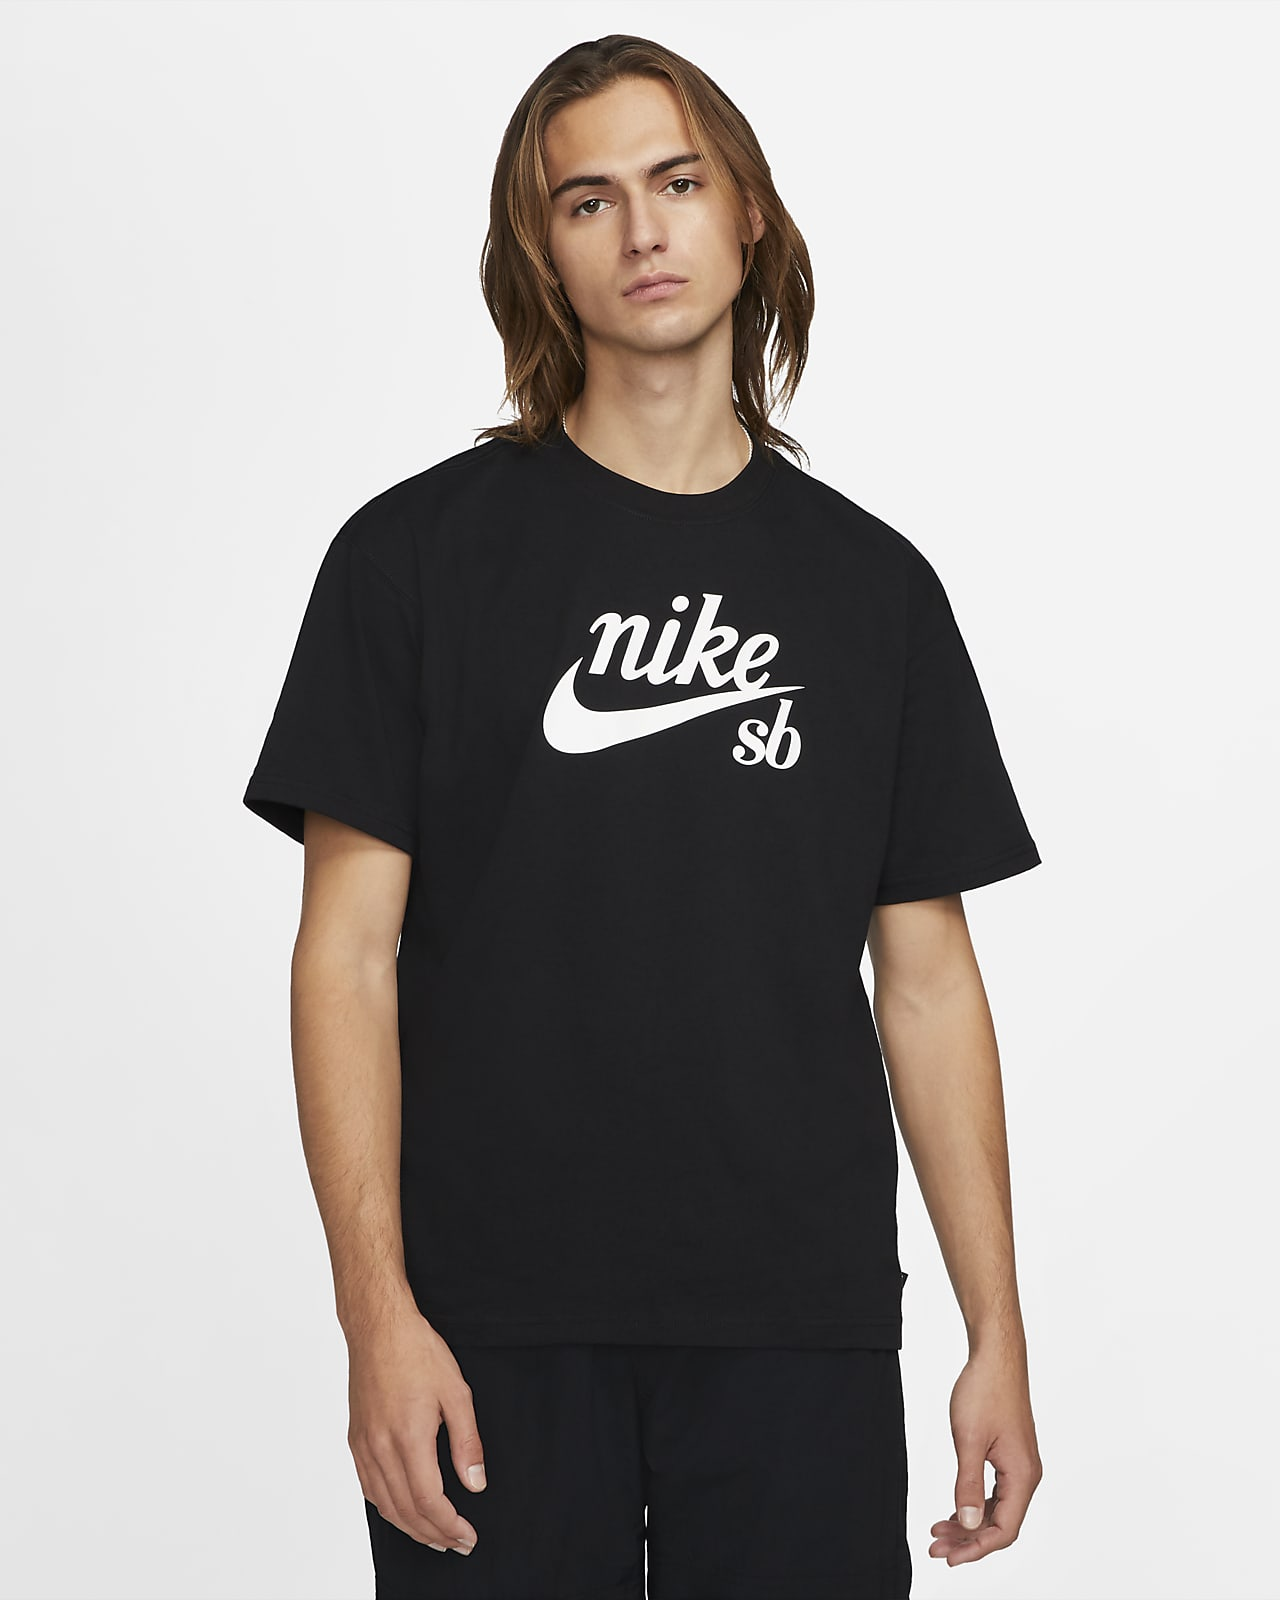 Playera de skateboarding Nike SB